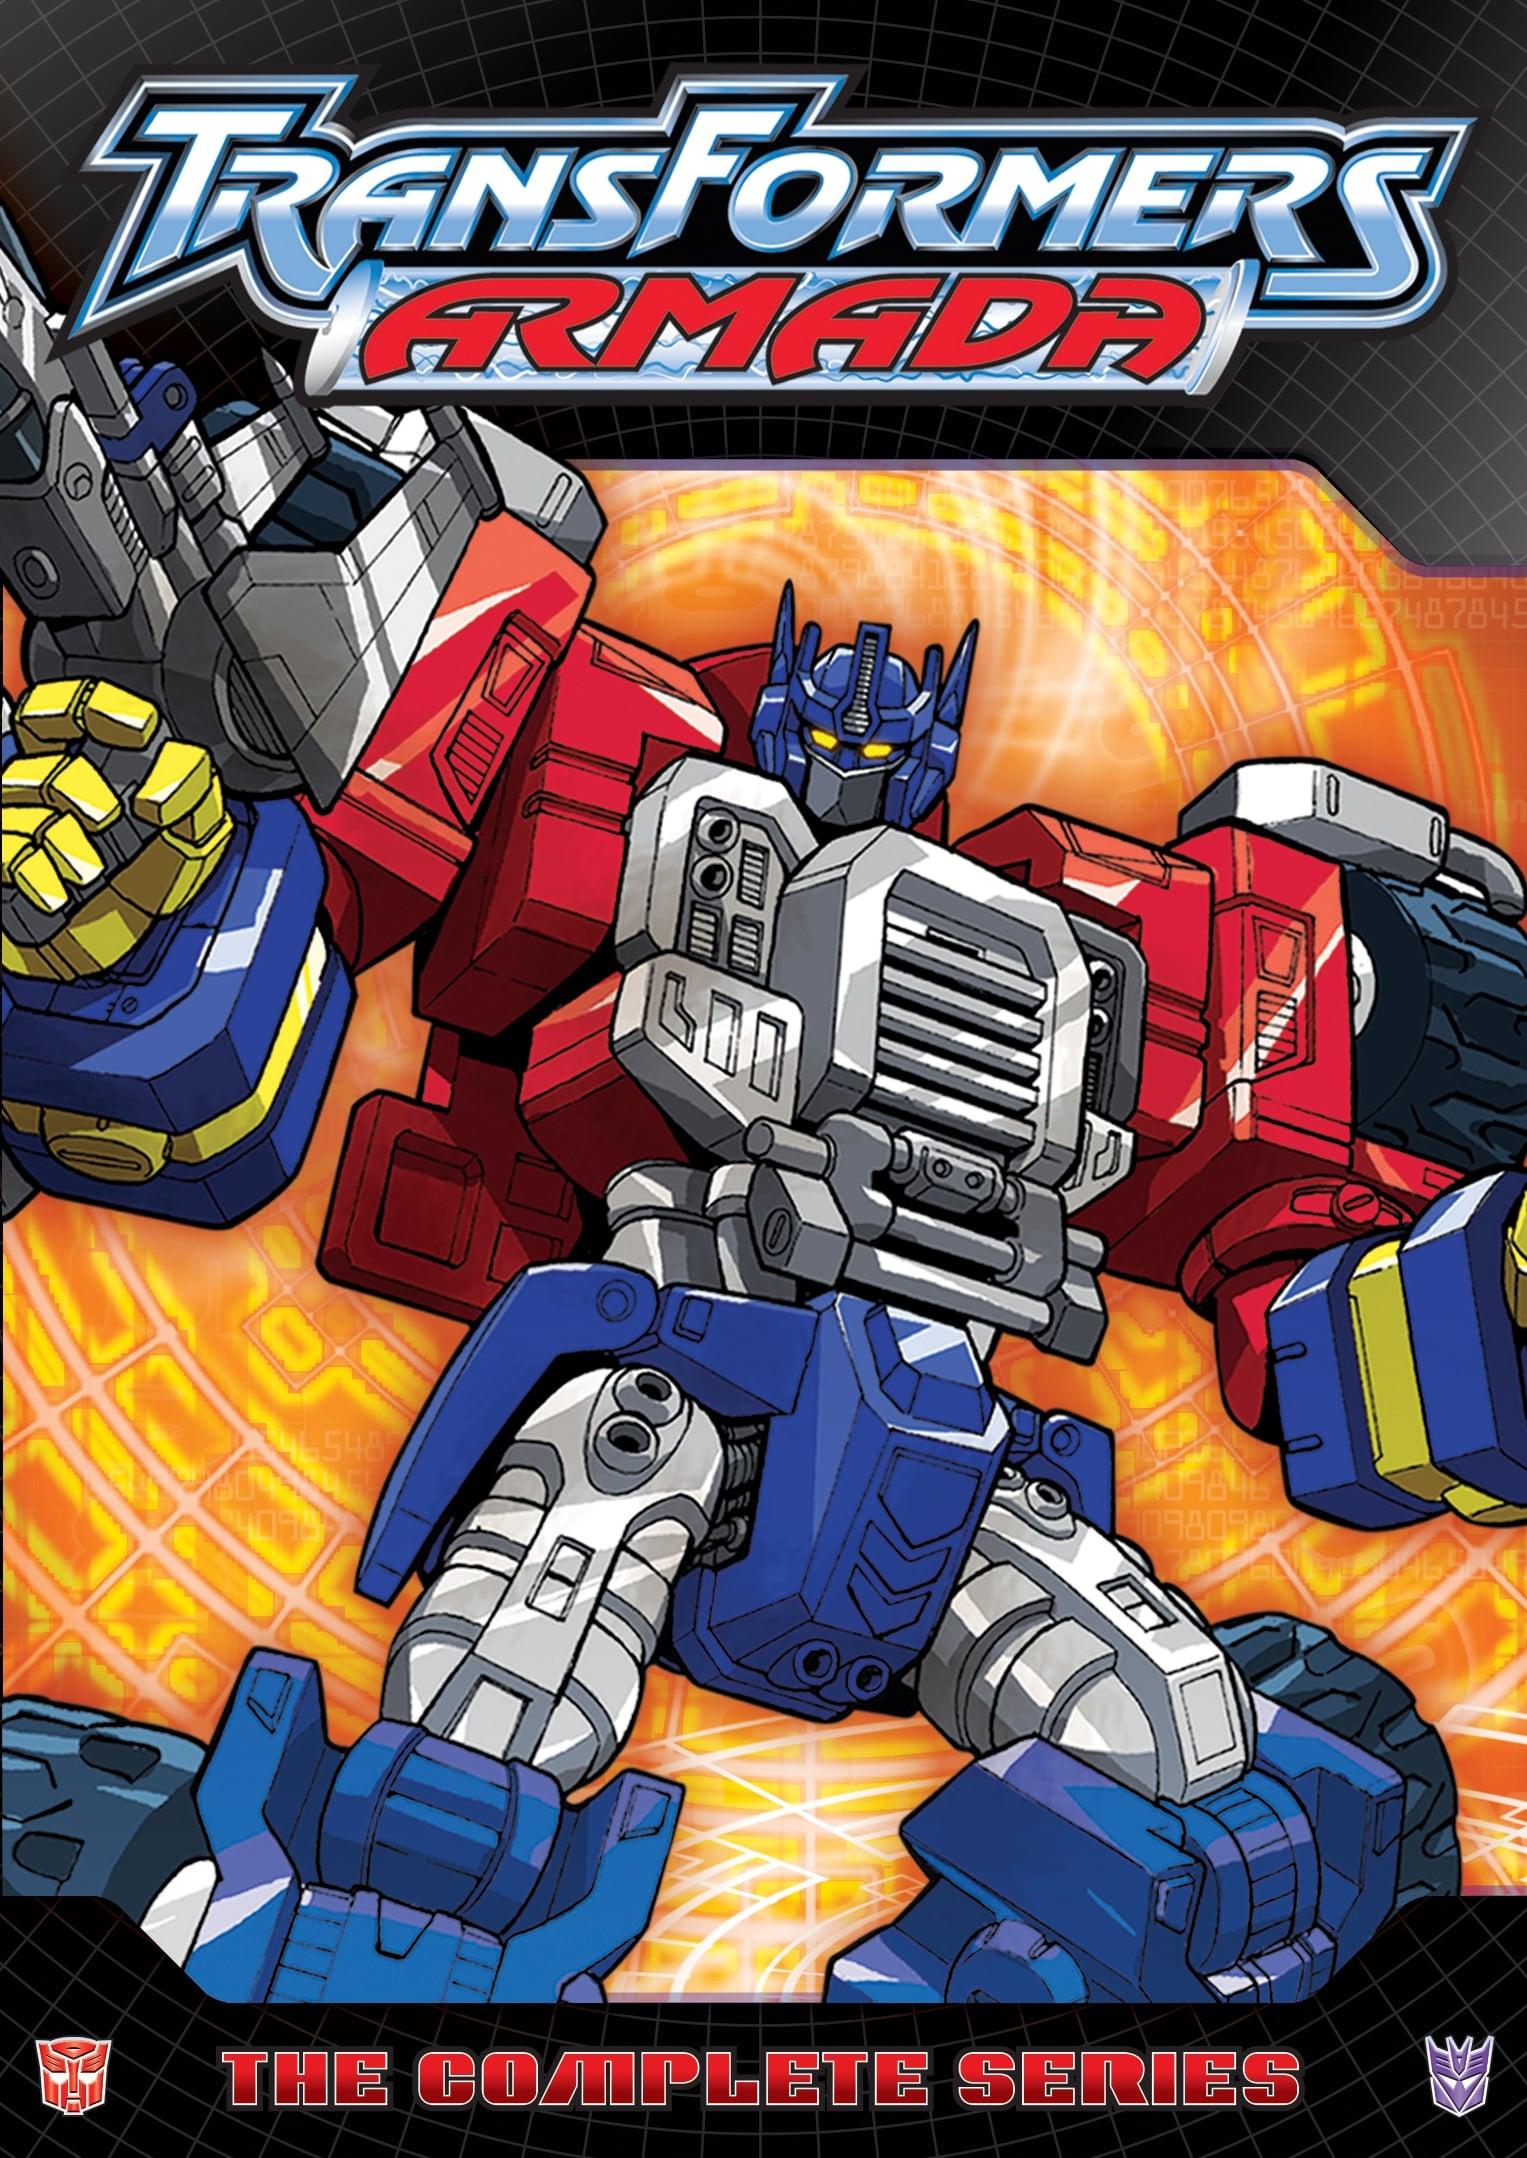 Transformers: Armada (2002)